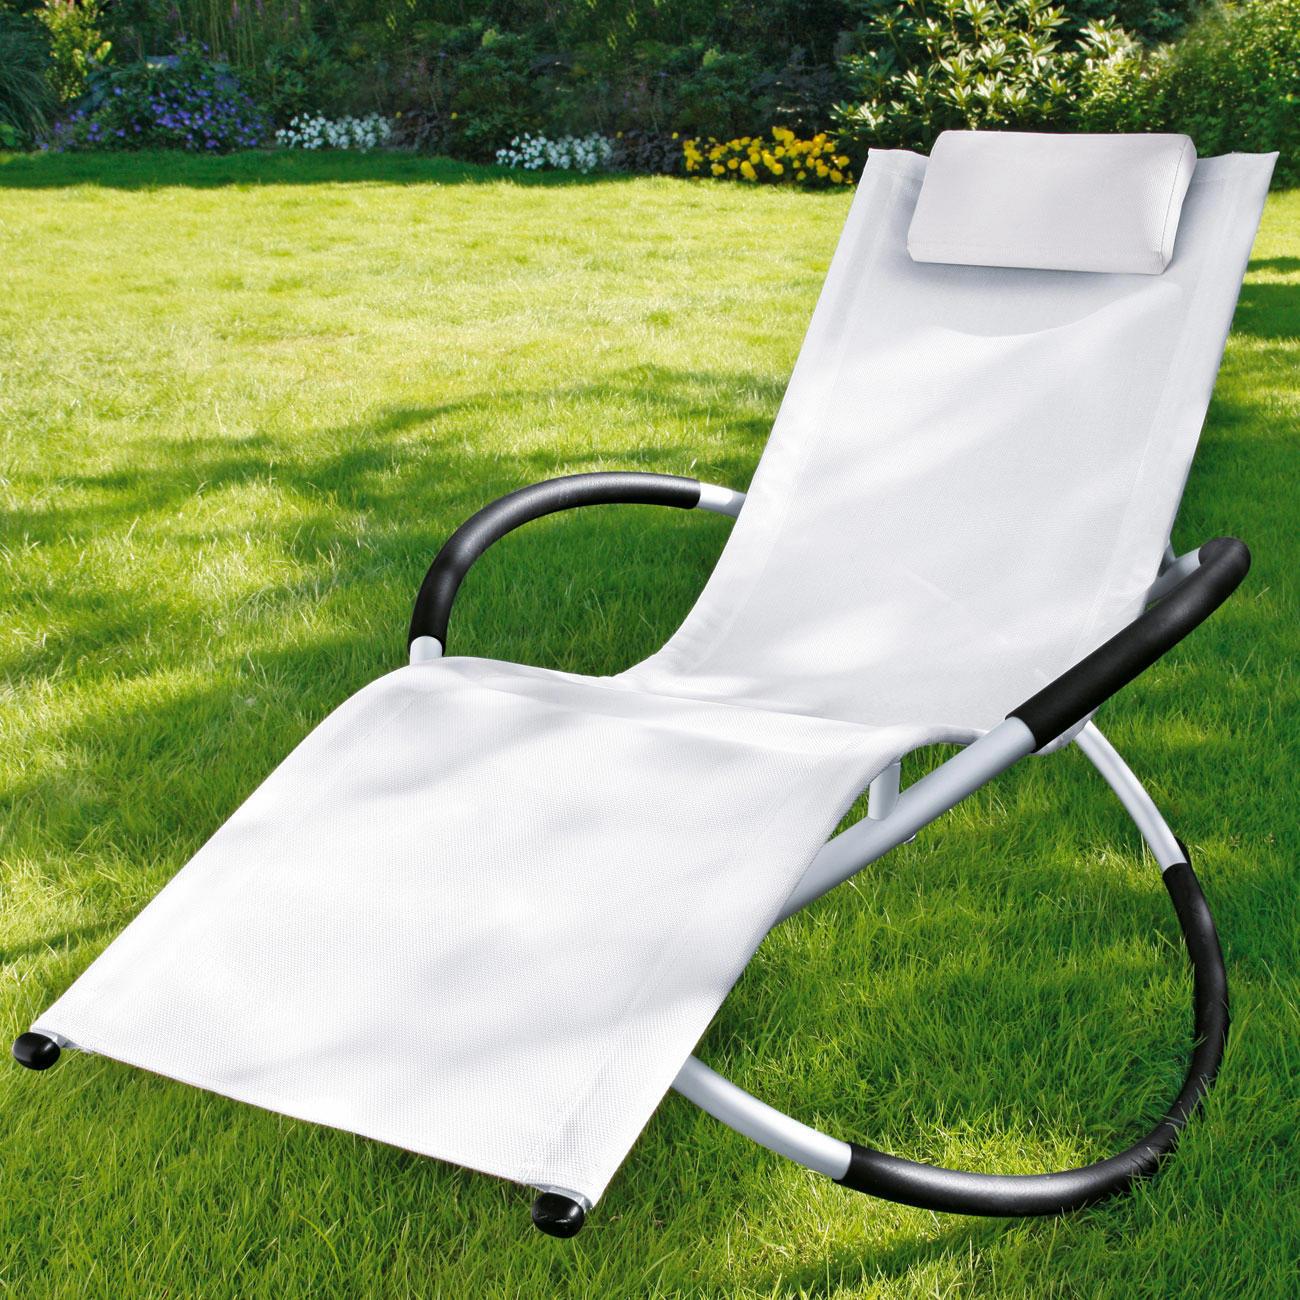 Rocking Chair Garantie Produit De 3 Ans. Full resolution  file, nominally Width 1300 Height 1300 pixels, file with #6E8A25.